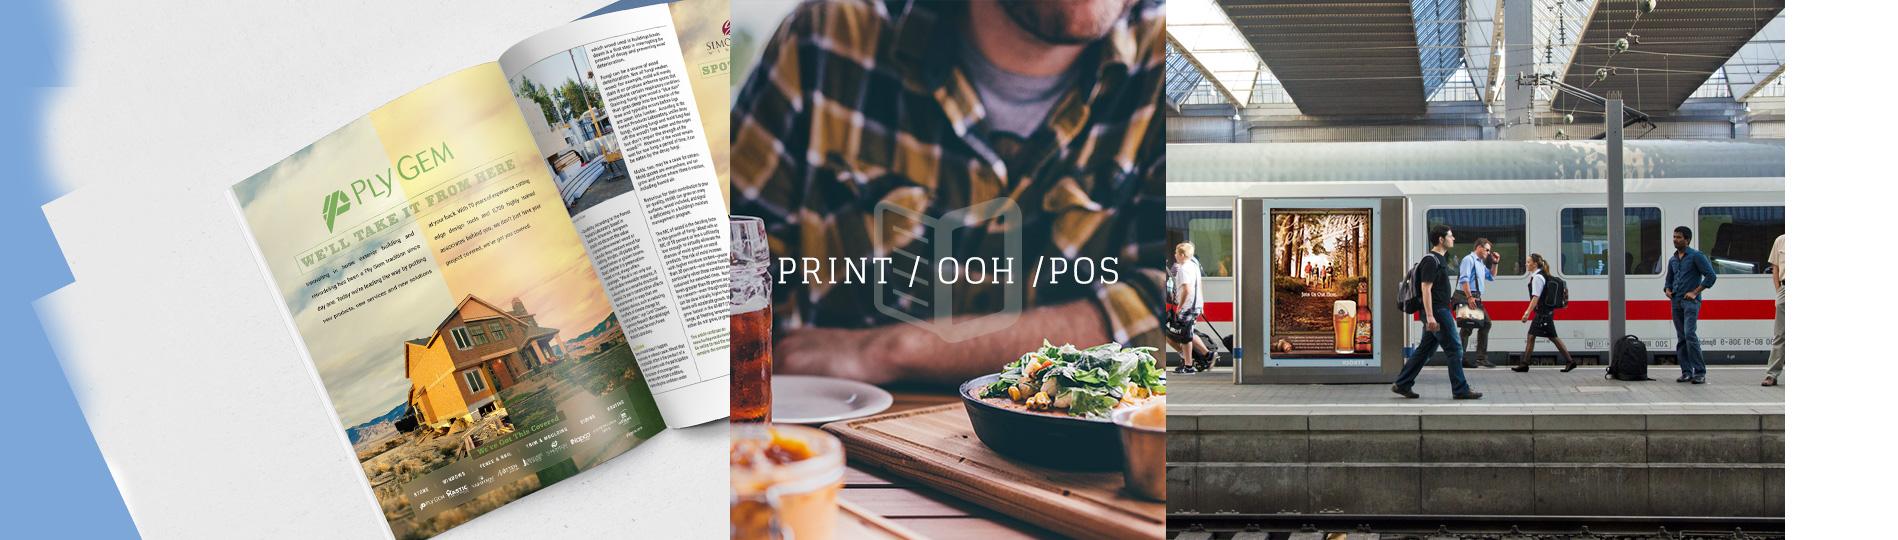 Capabilities_Print-OOH-POS.jpg